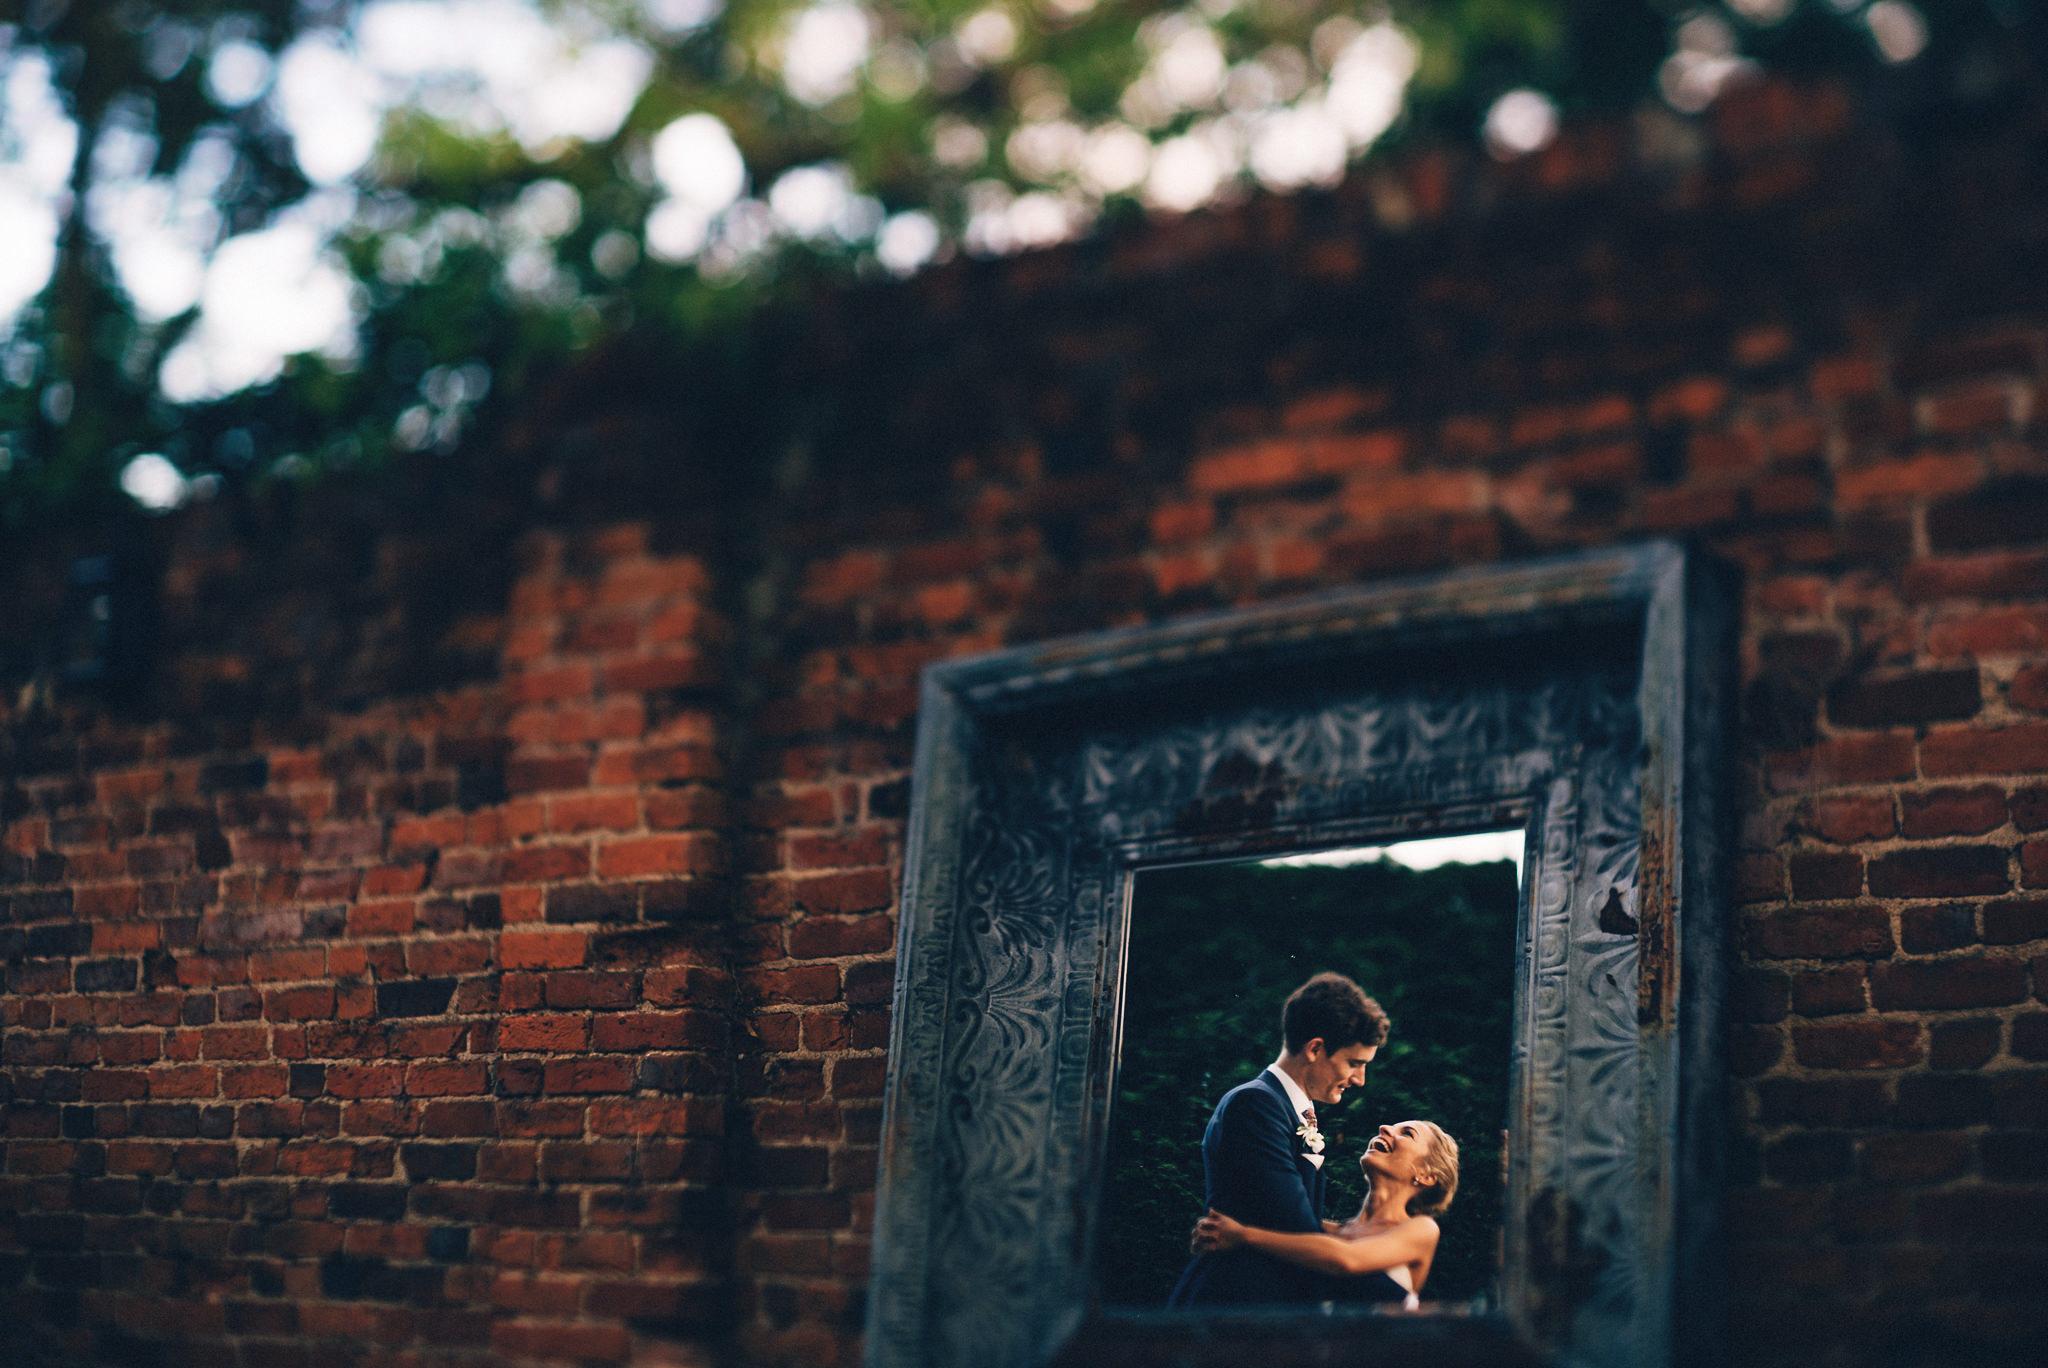 paul-marbrook-Gaynes-Park Wedding-Photographer-90133